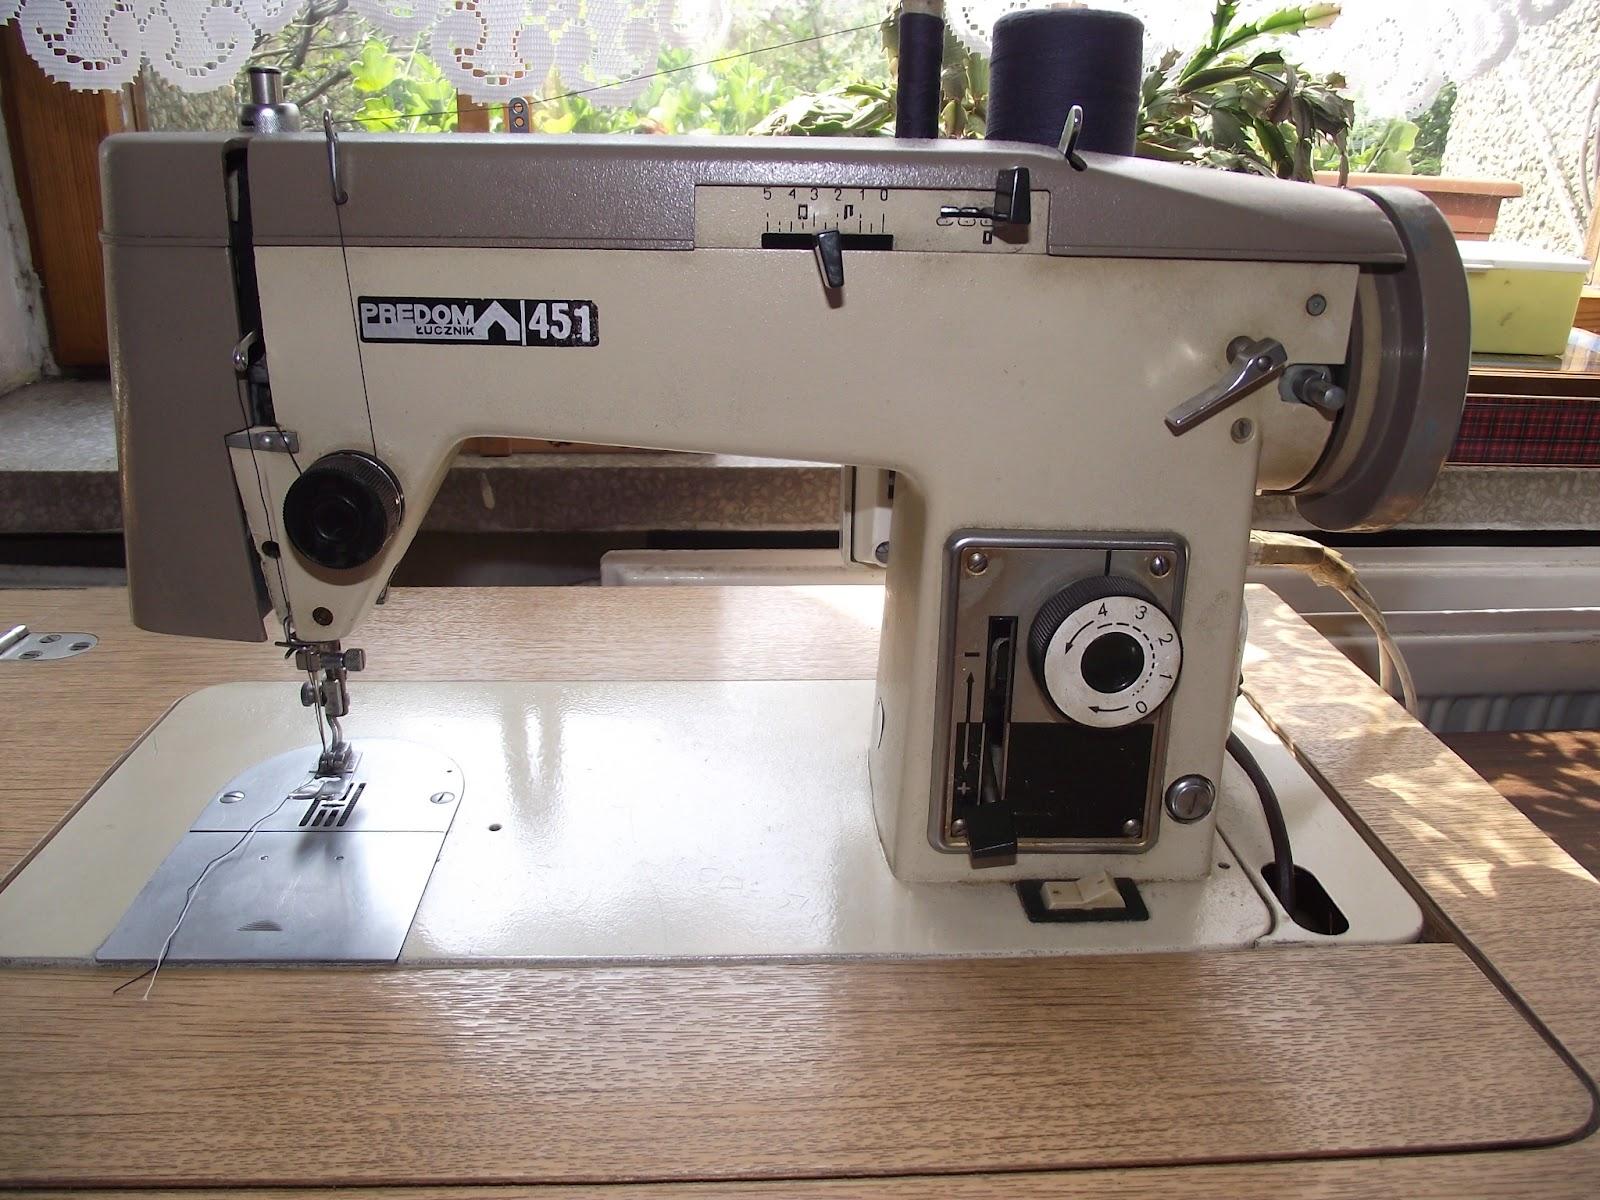 lizzie lenard vintage sewing a polish sewing machine lucznik predom 415. Black Bedroom Furniture Sets. Home Design Ideas